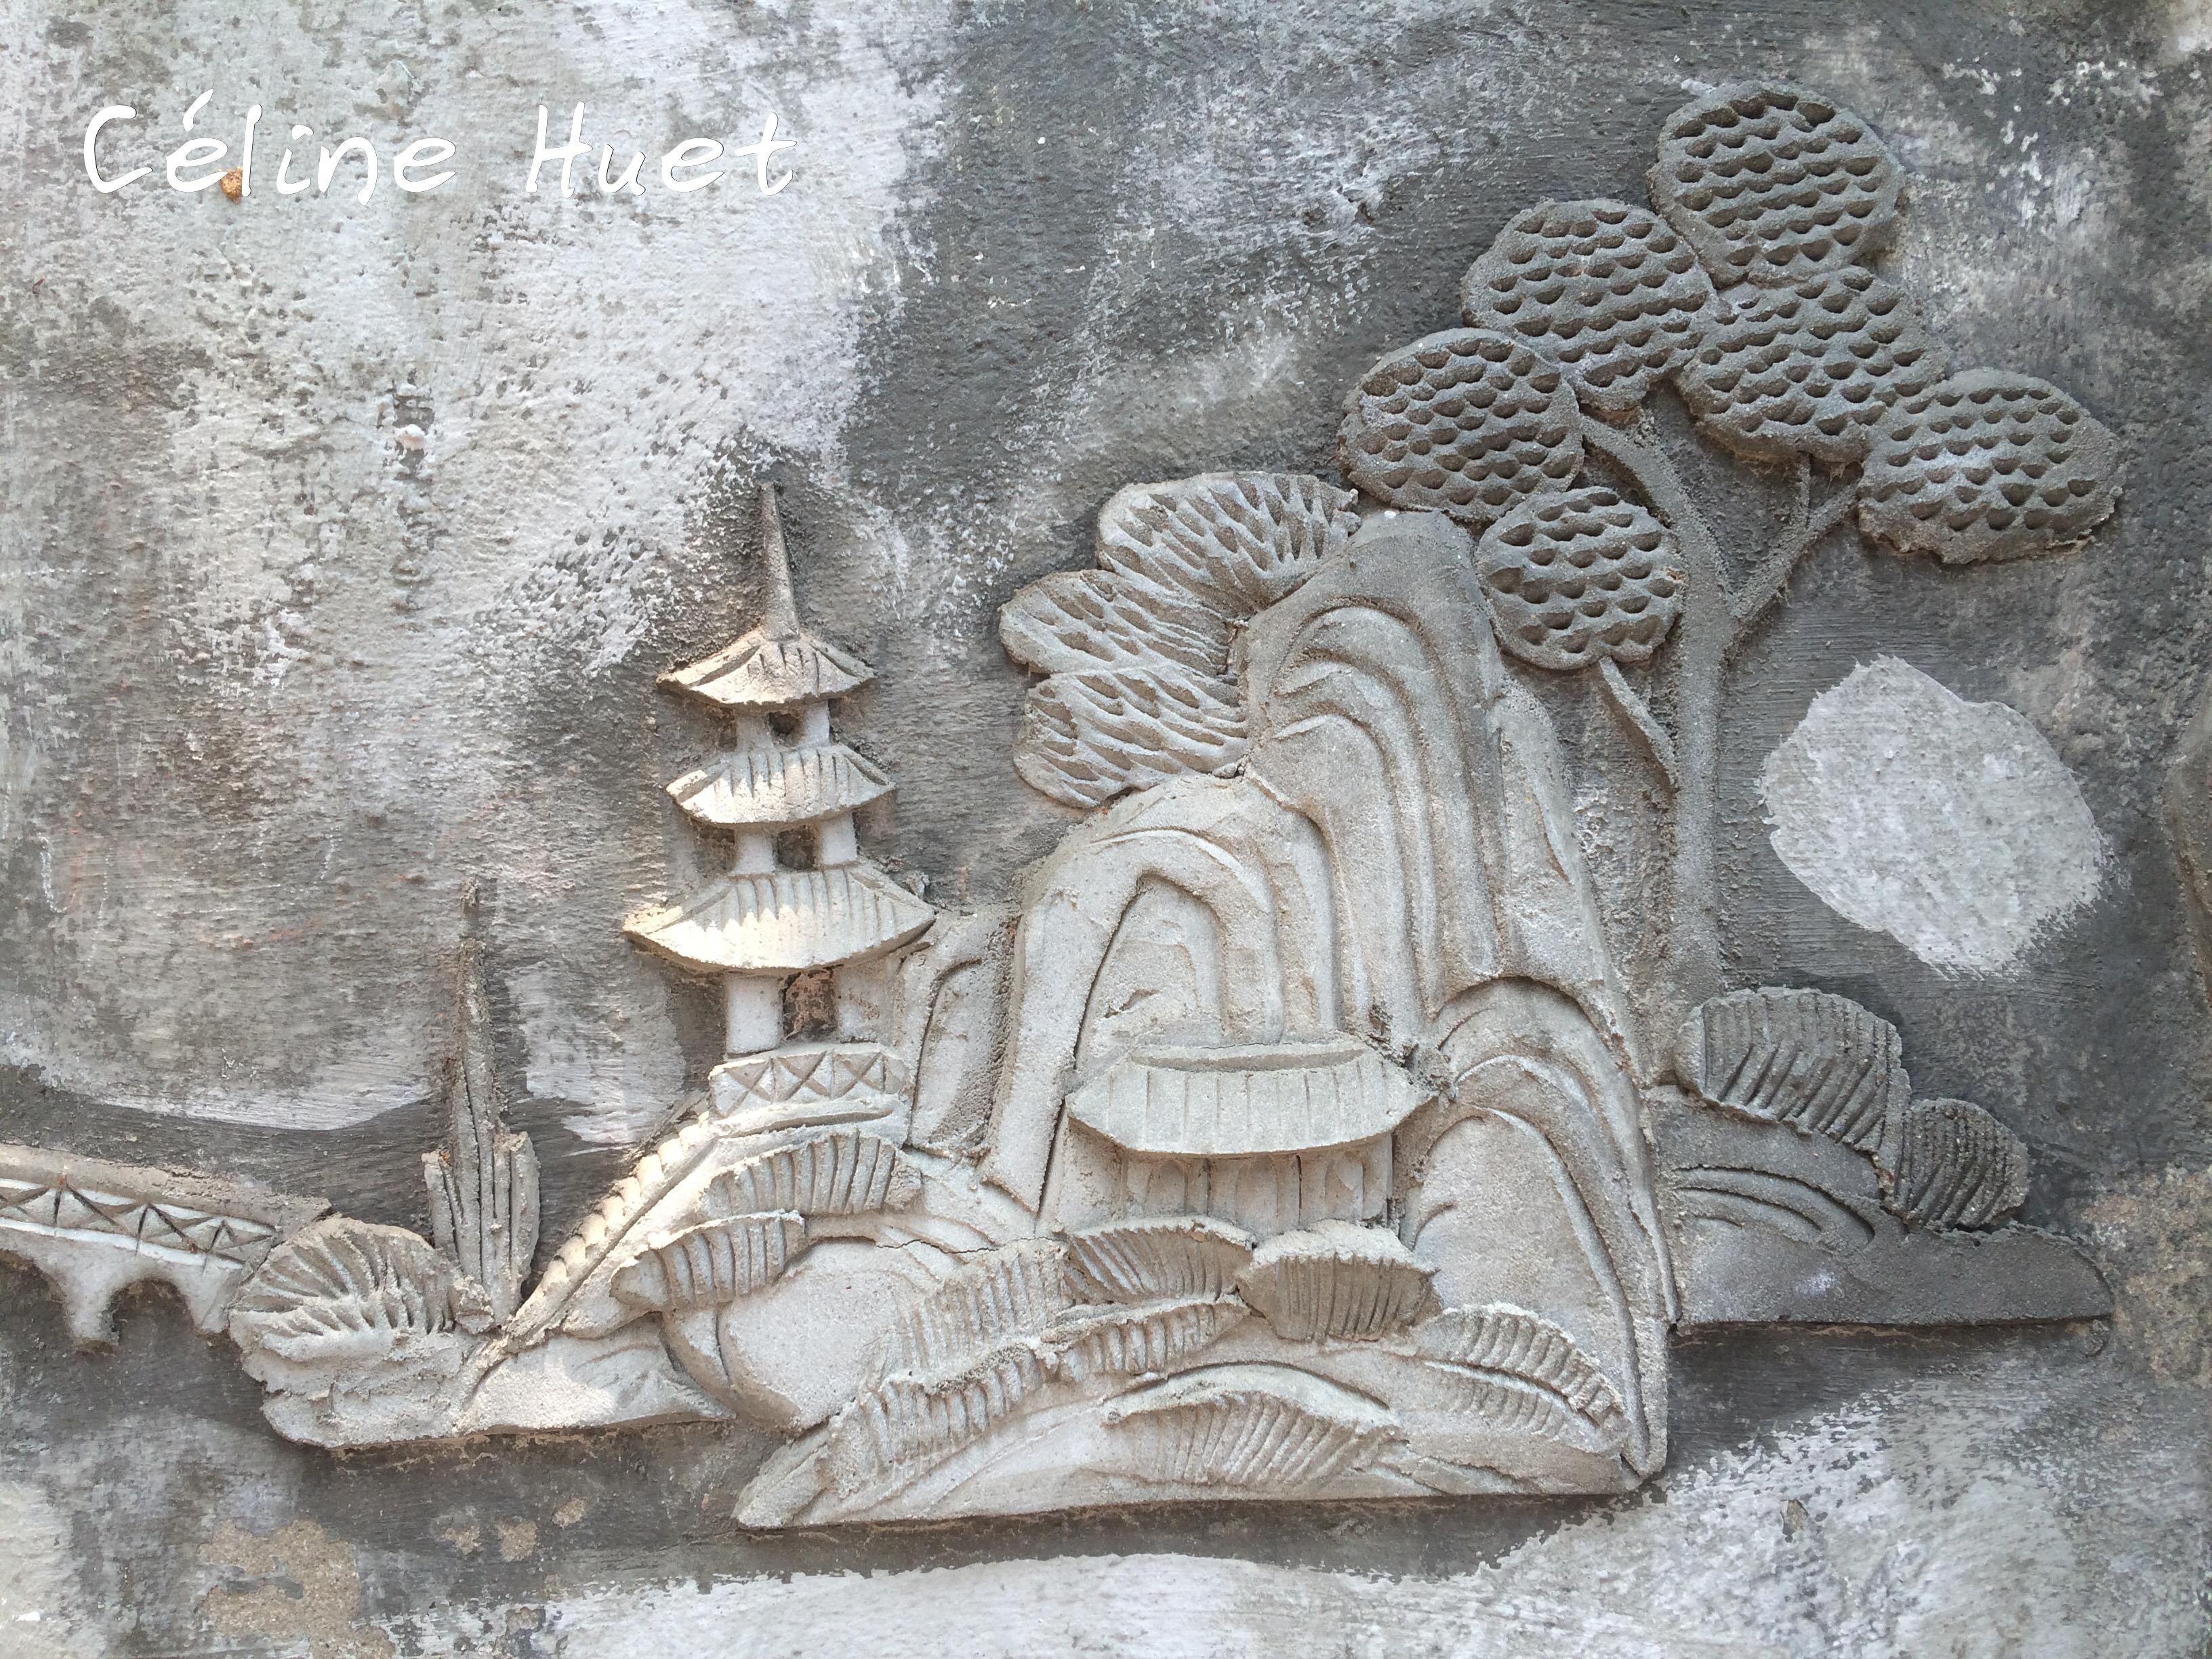 Xa Loi Tower Montagnes de marbre Da Nang Vietnam Asie